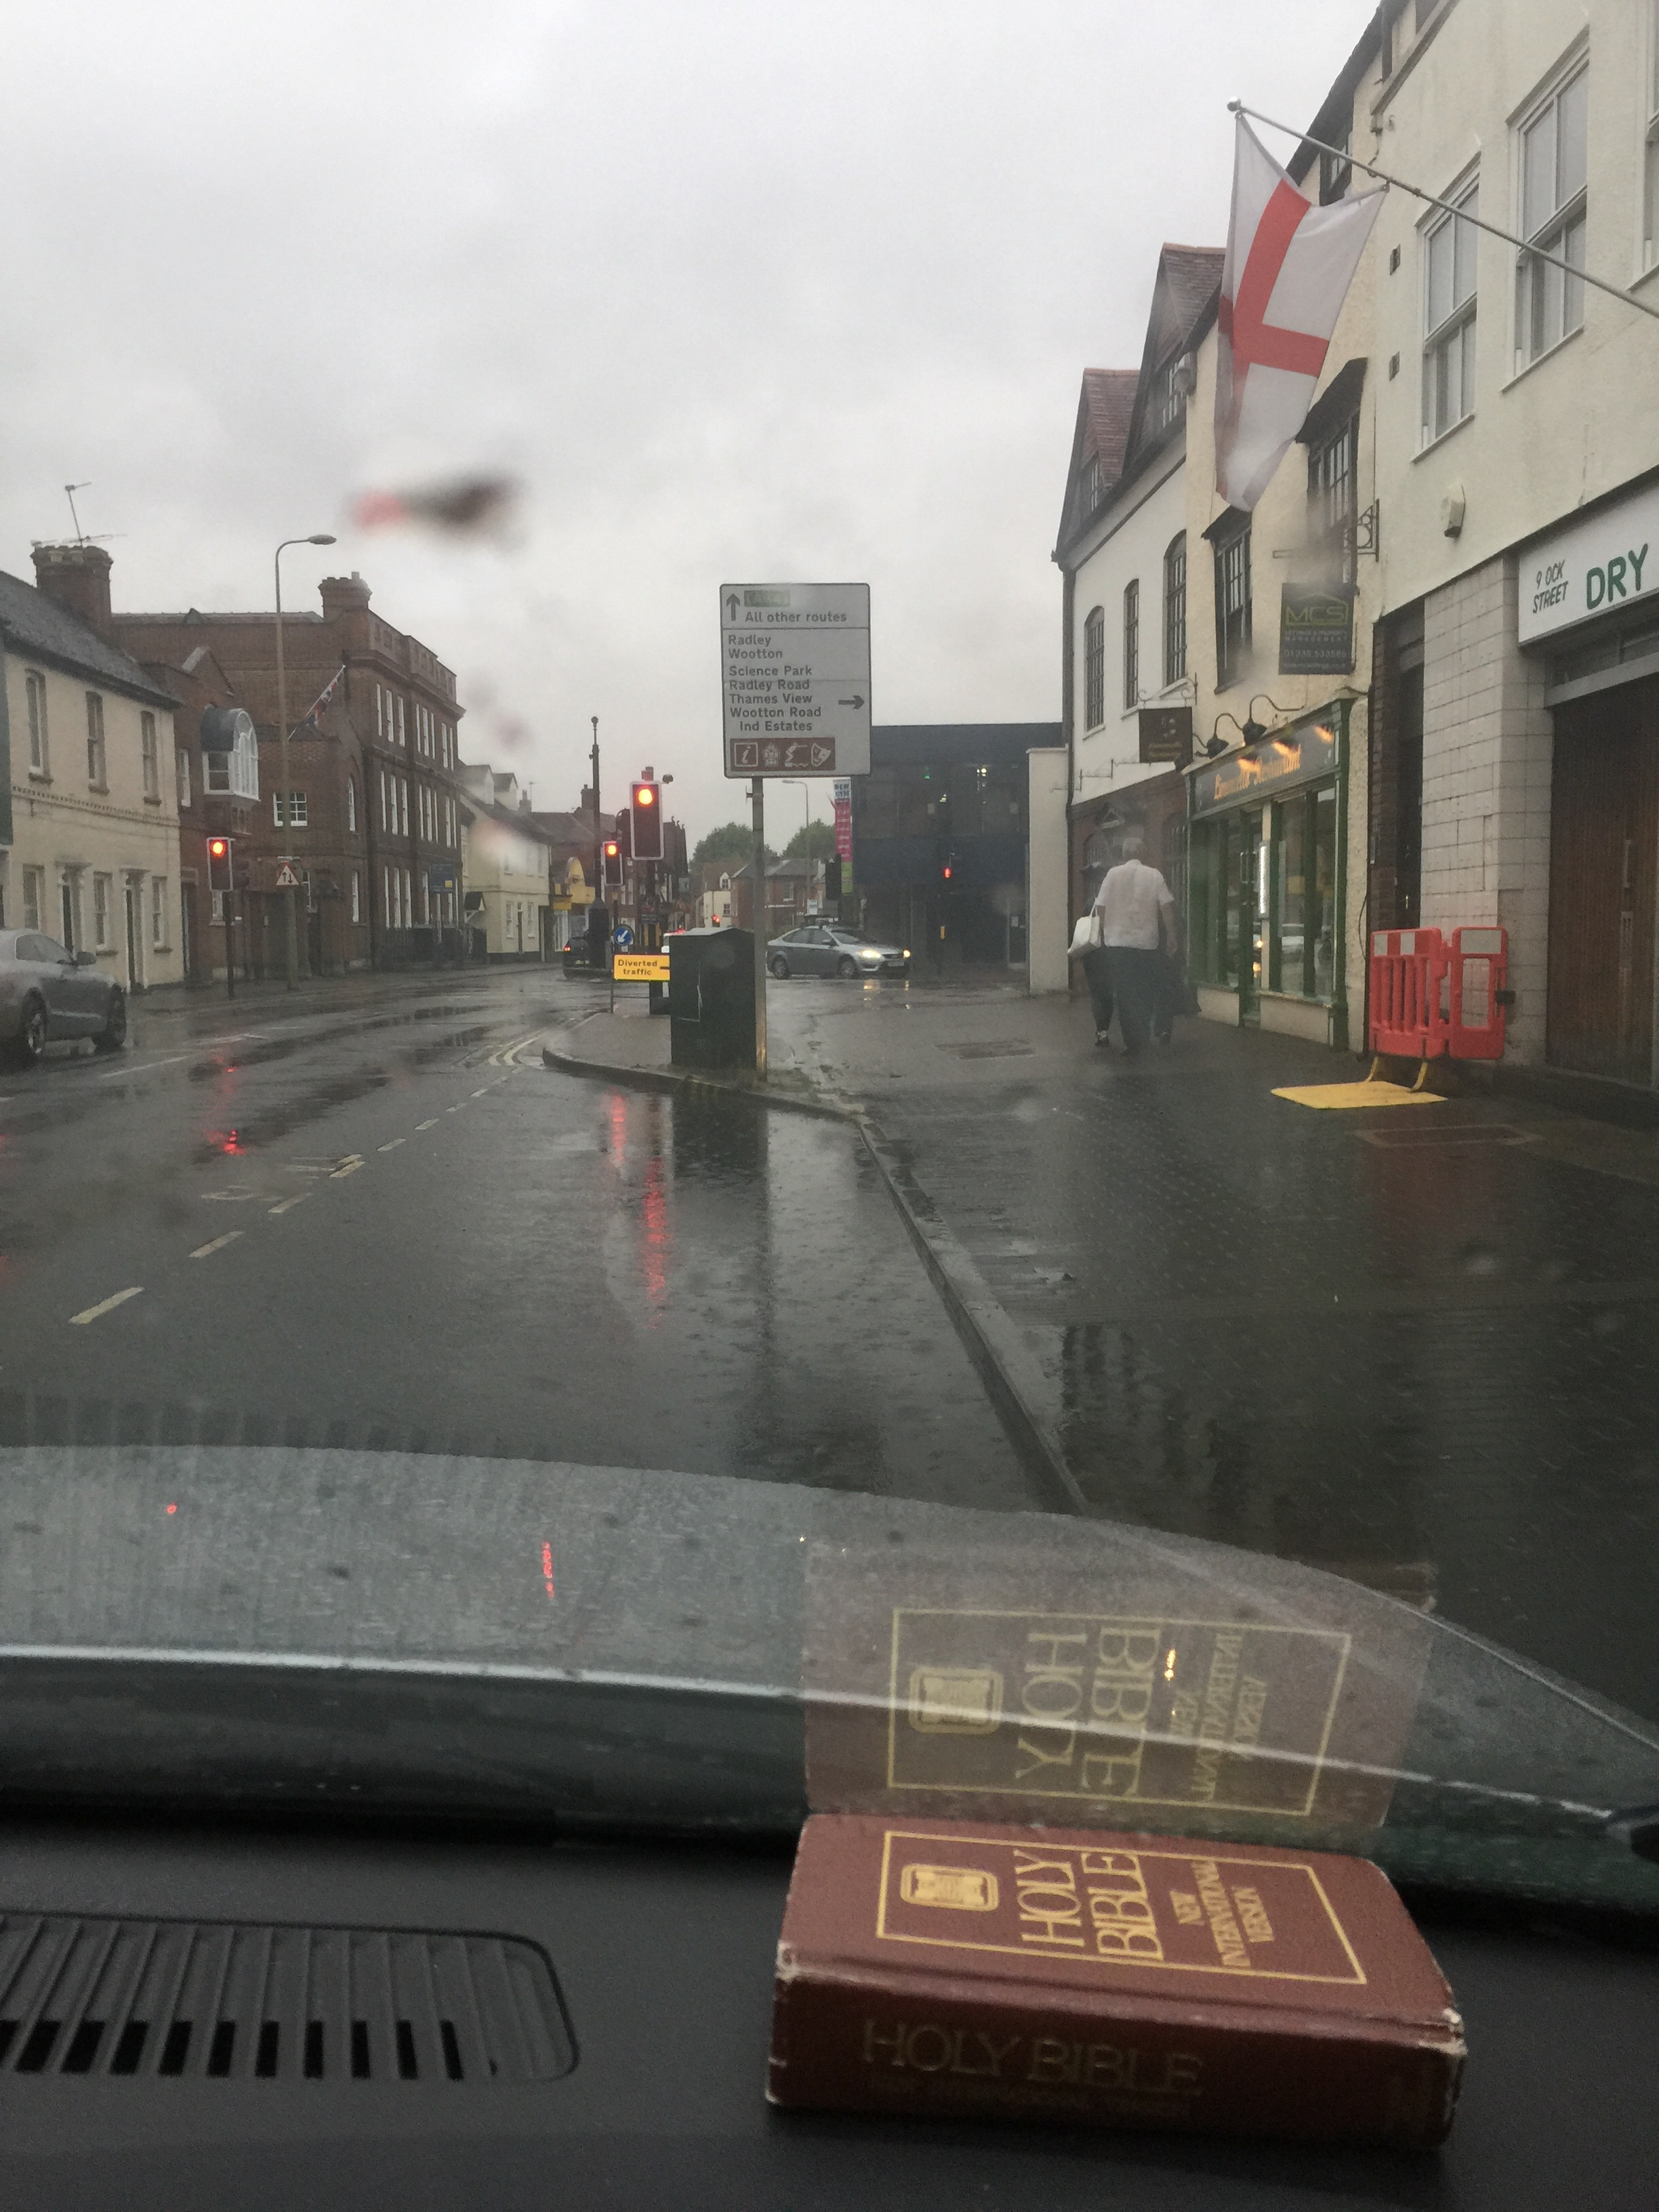 Taxi rank, on Ock Street, Abingdon, in the rain